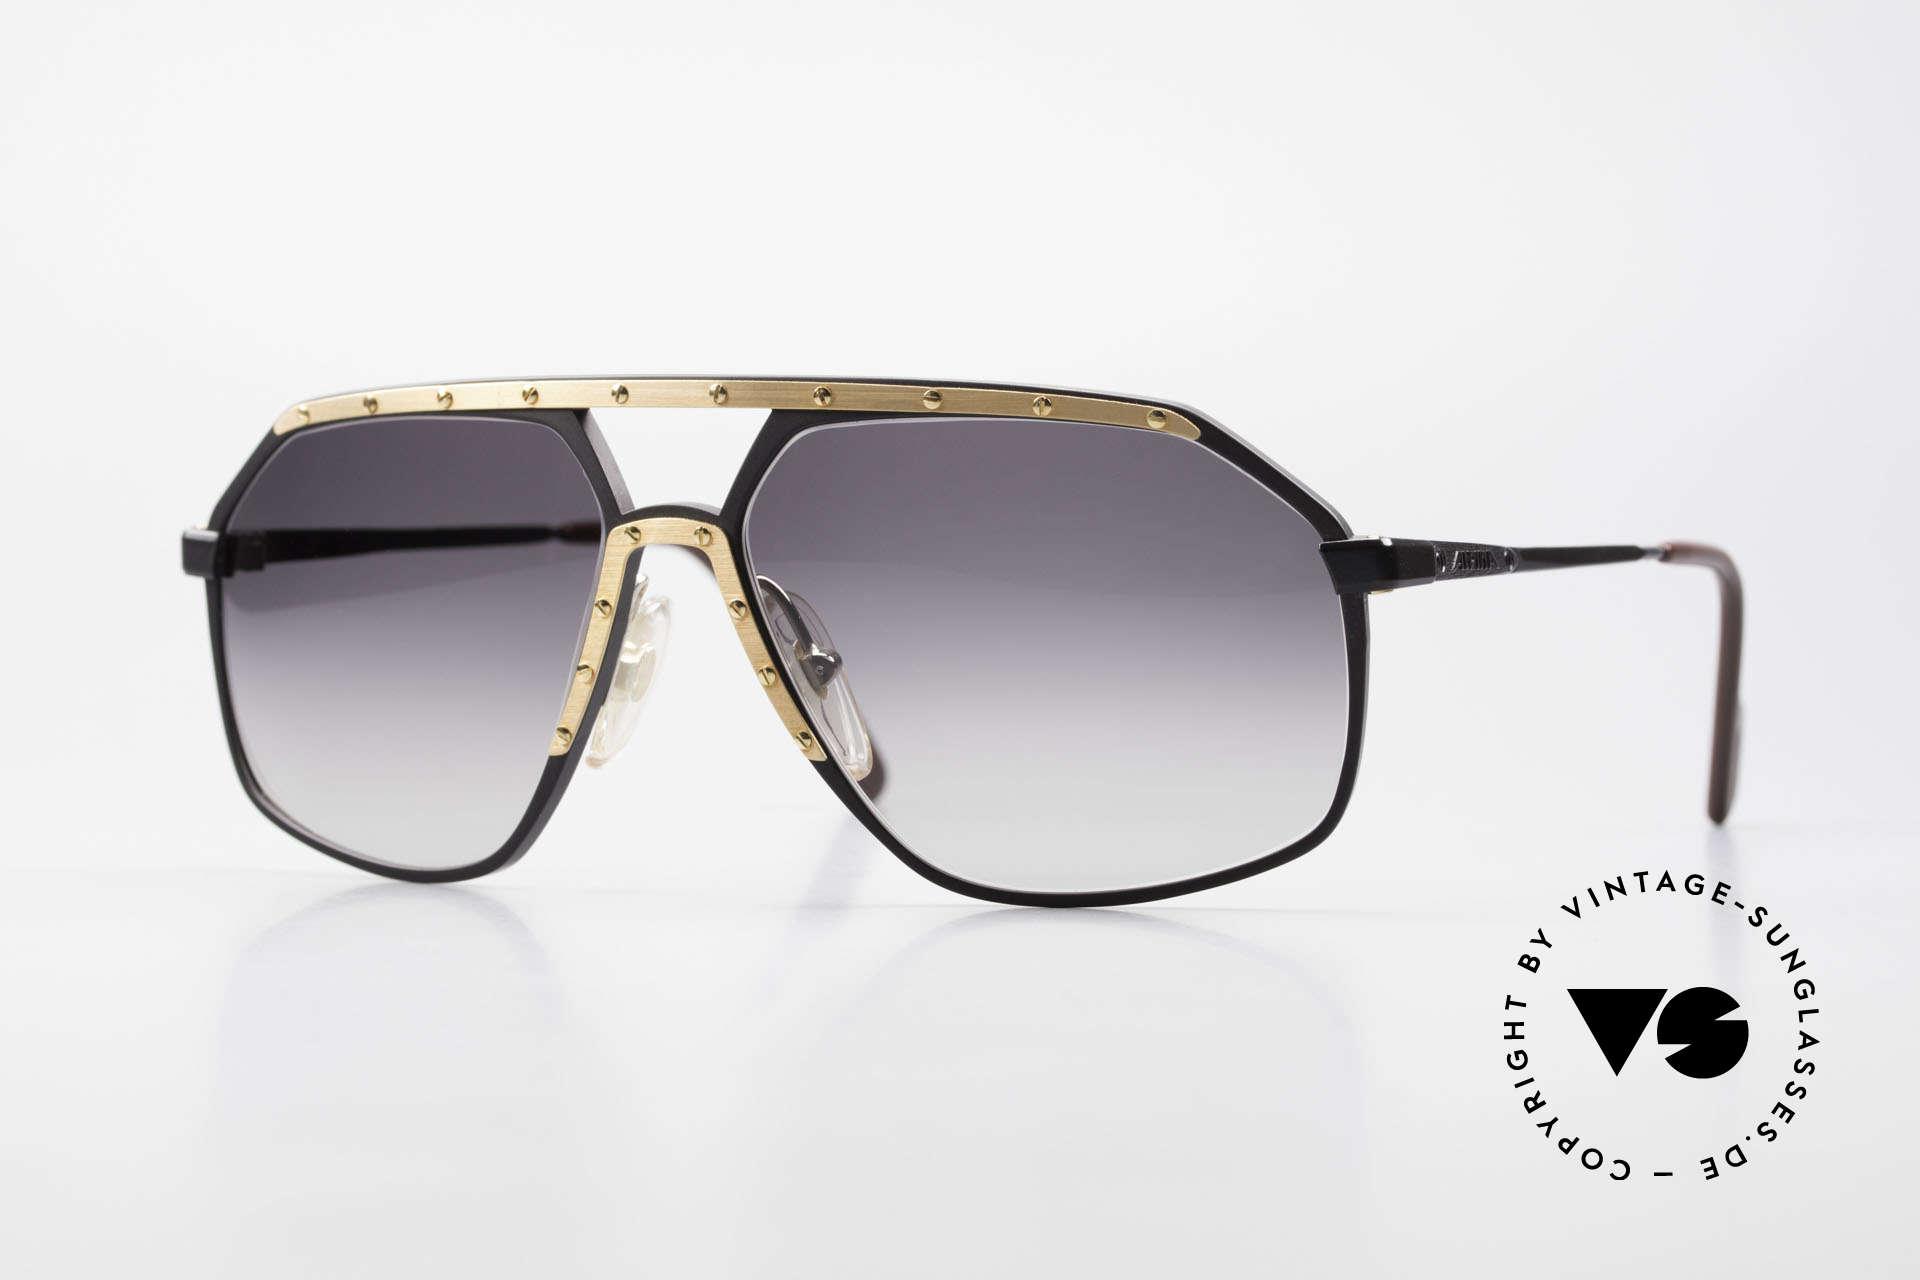 Alpina M6 No Retro Shades True Vintage, old Alpina model M6 vintage designer sunglasses, Made for Men